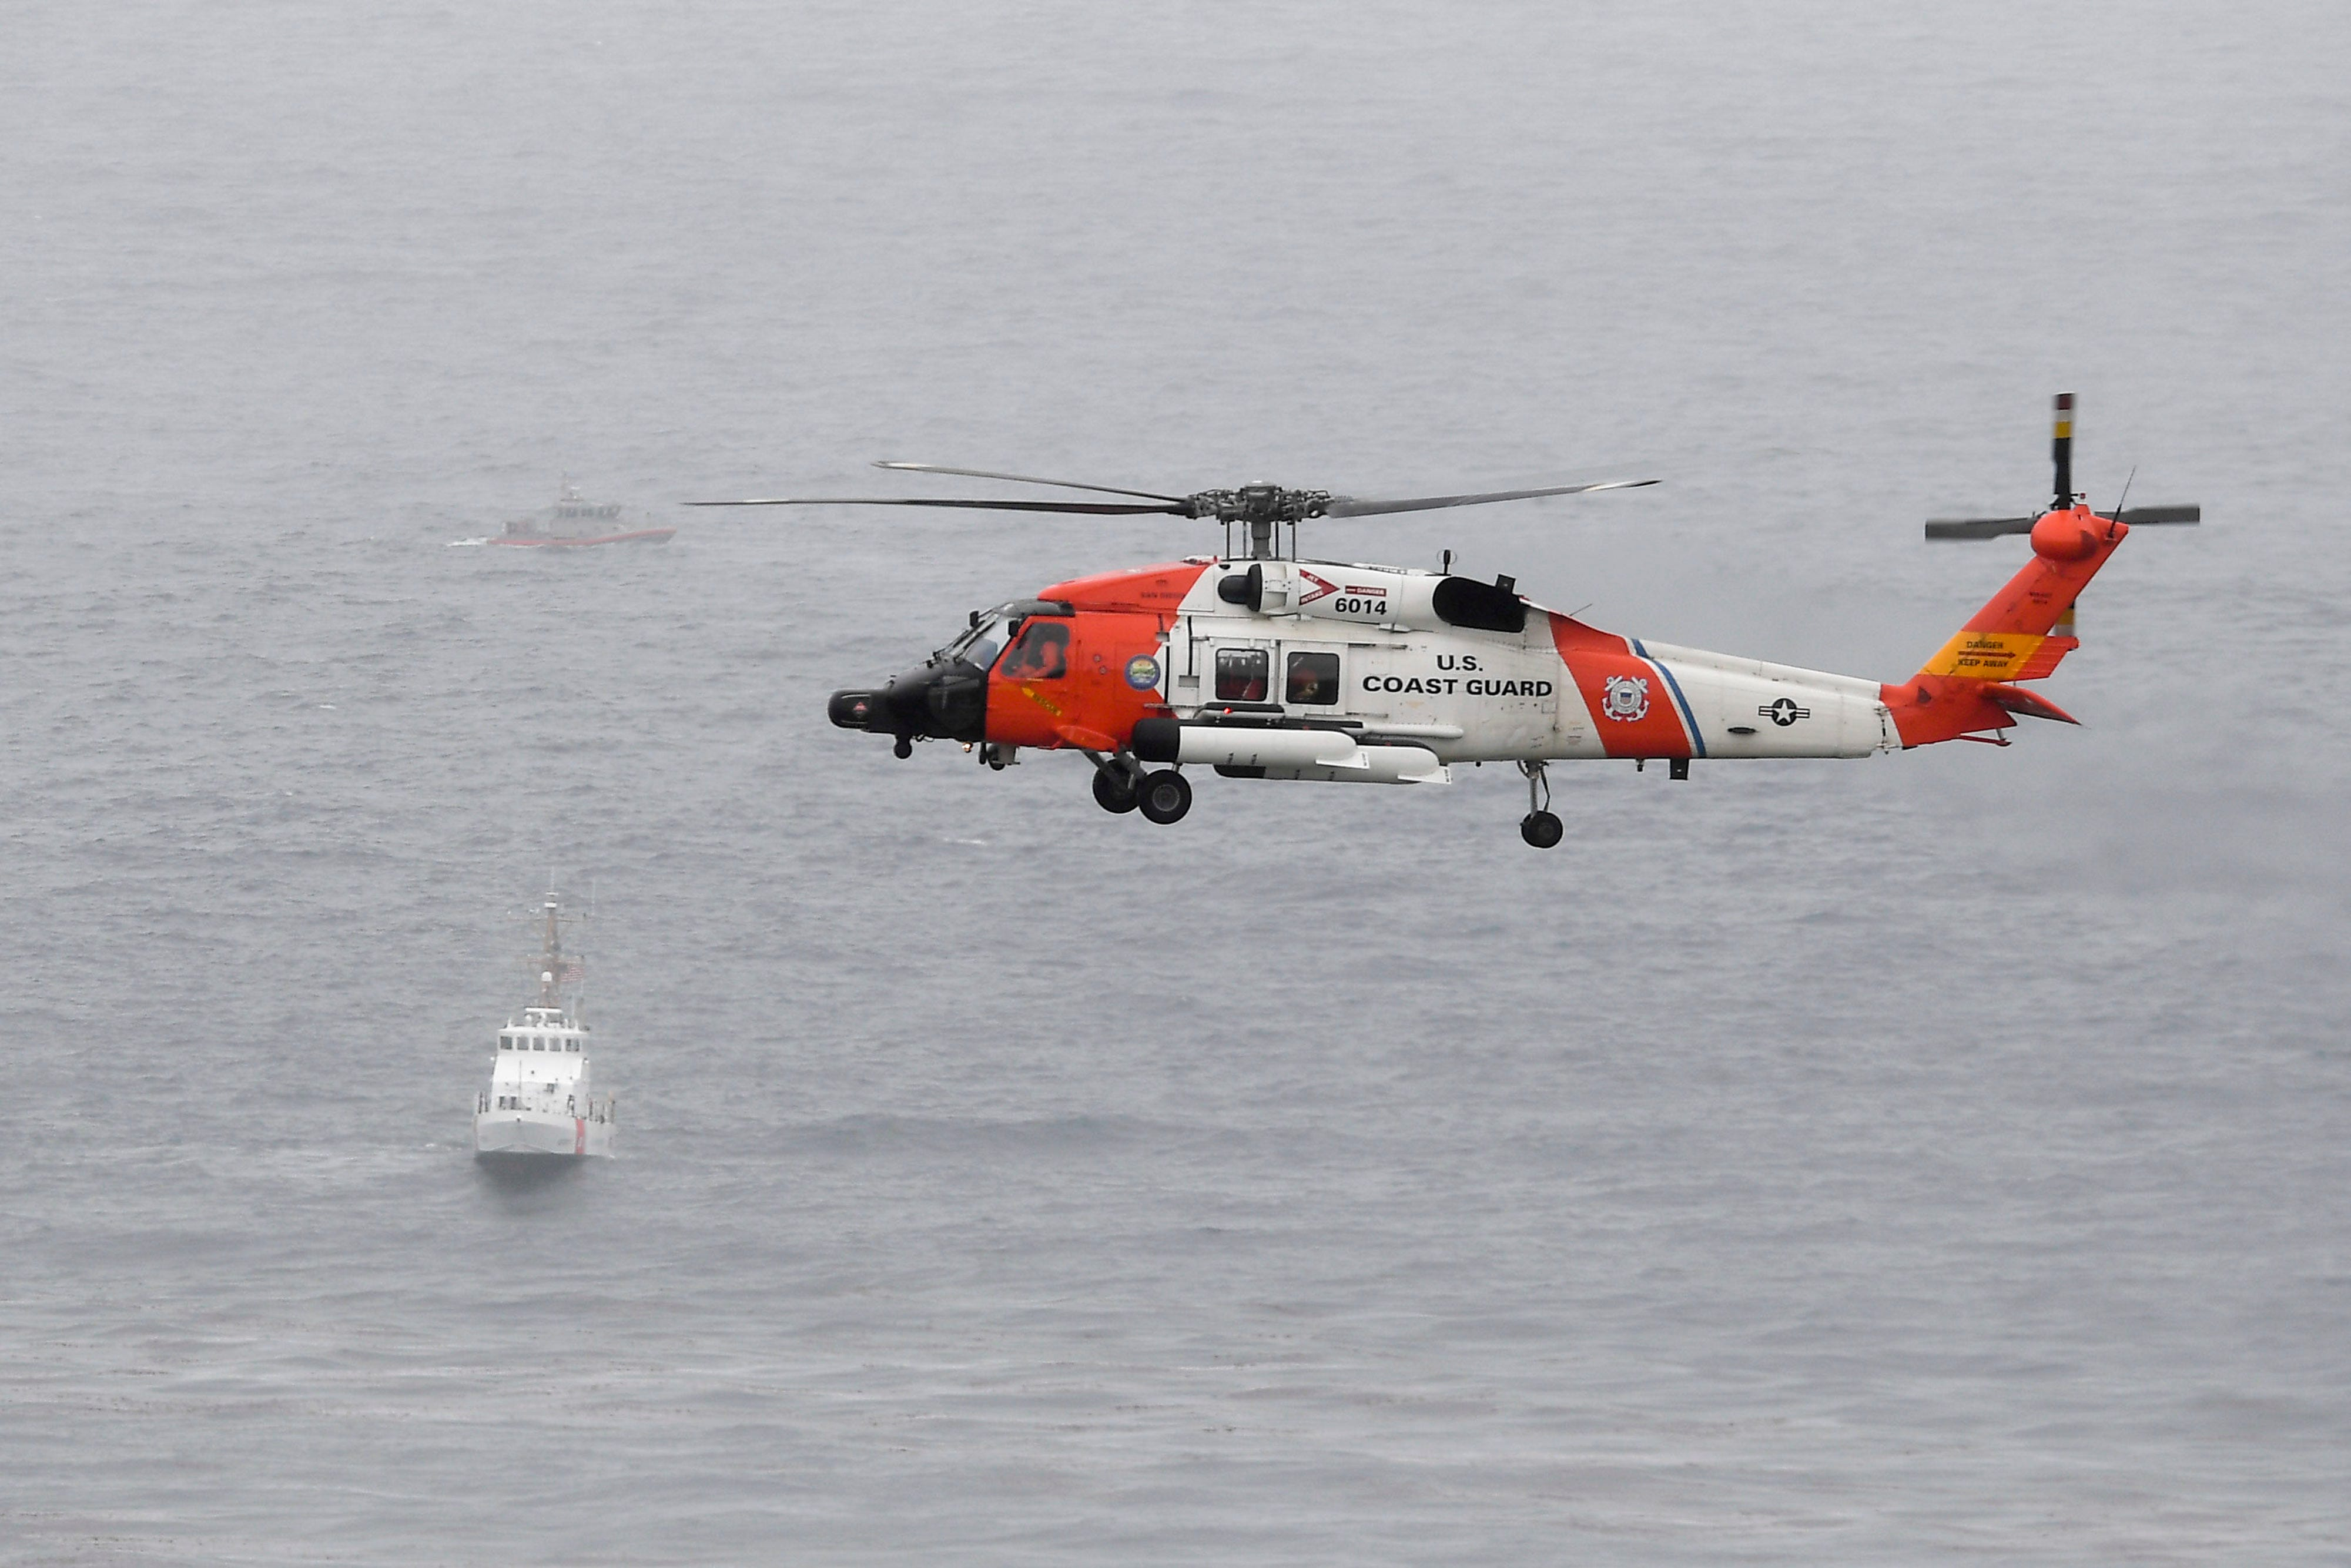 Boat capsizes off San Diego coast: at least 3 dead, dozens injured